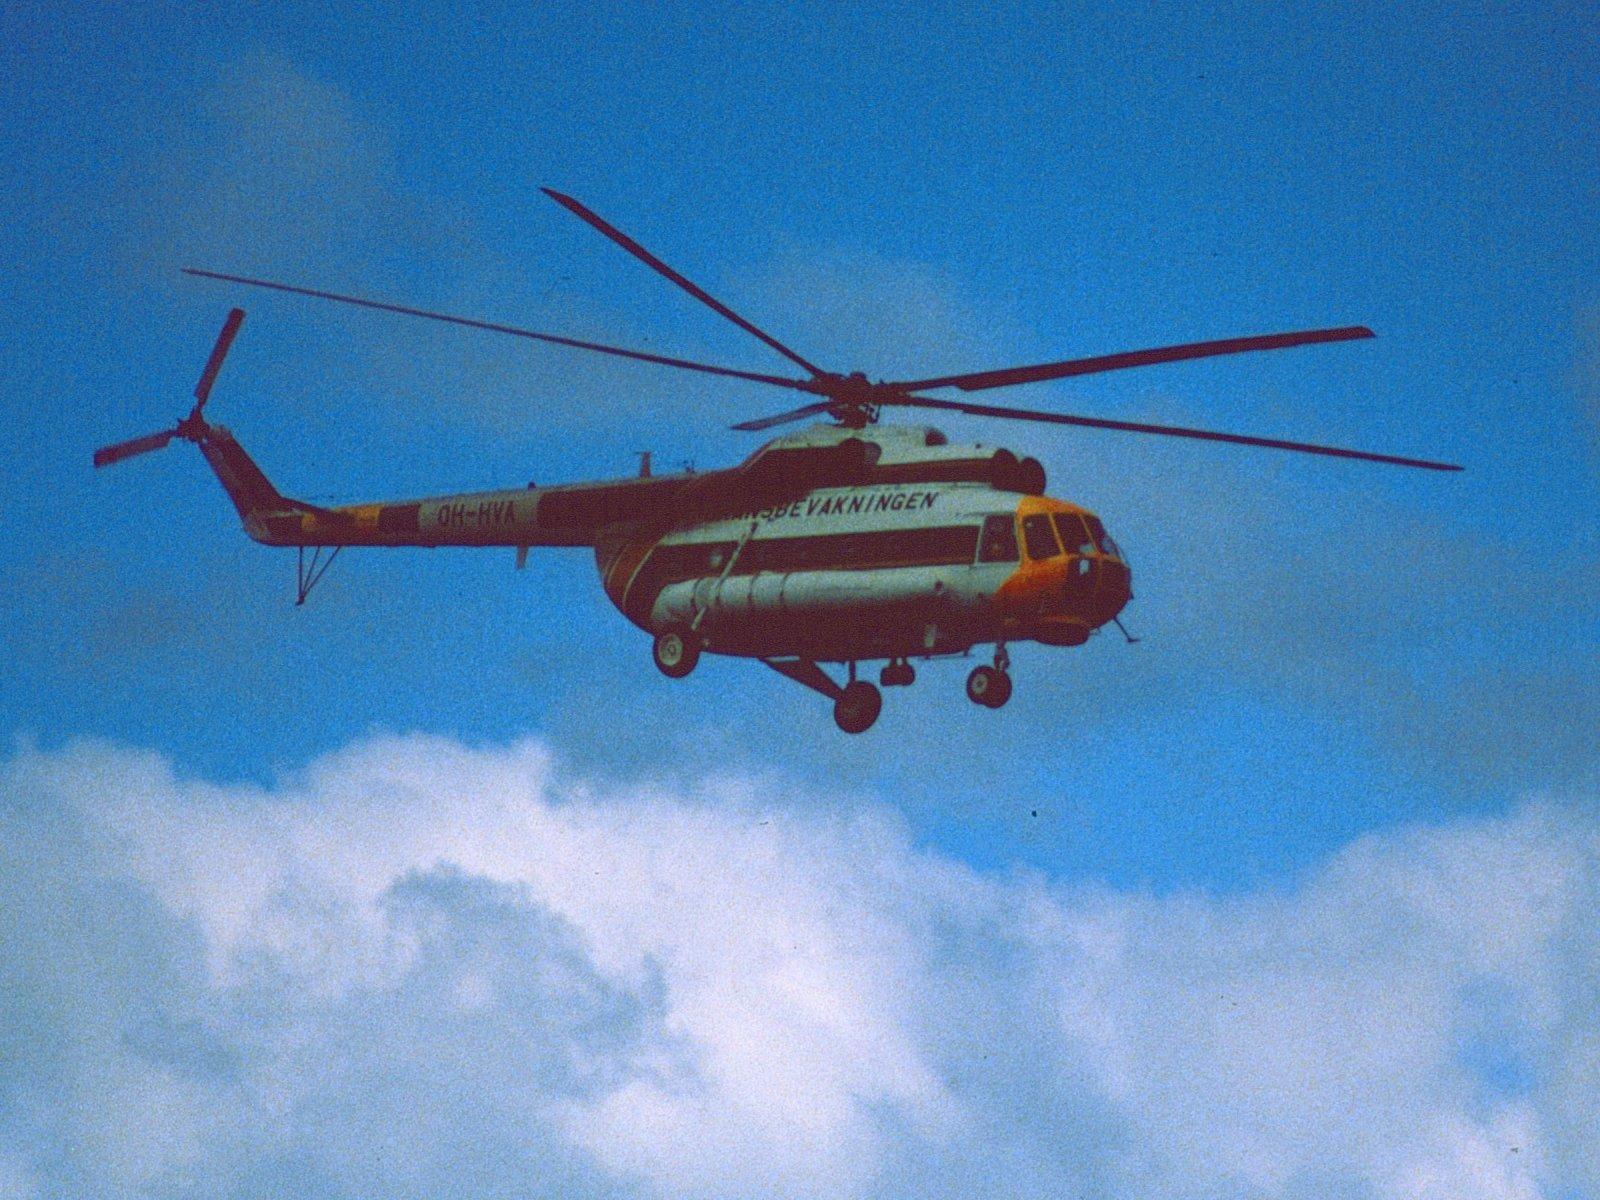 Mil Mi-8T OH-HVA EFHK 1984-08-23